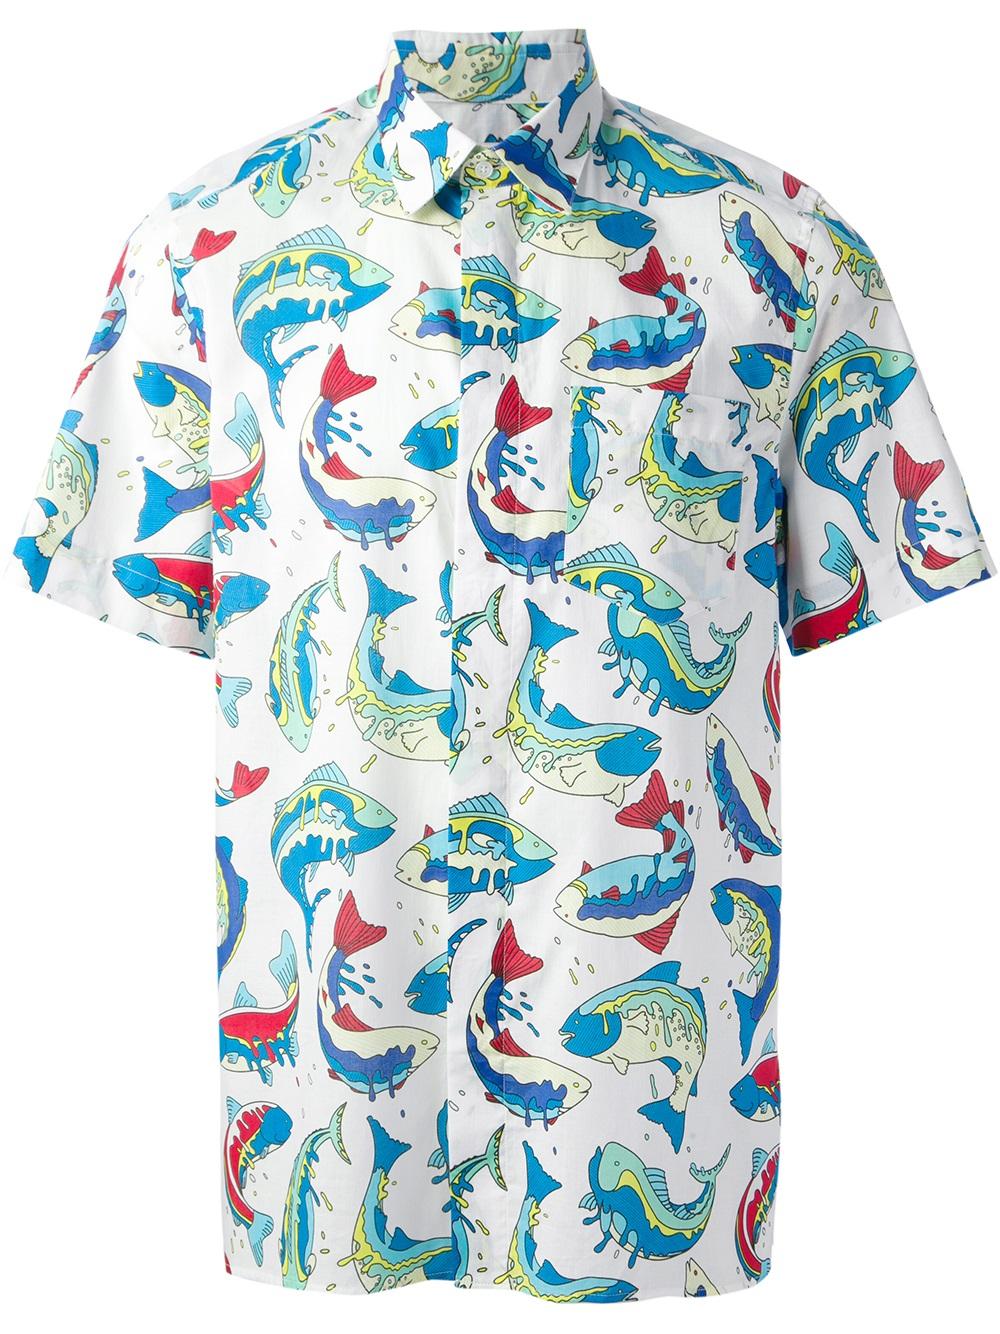 Lyst kenzo short sleeve shirt in blue for men for Fish print shirt